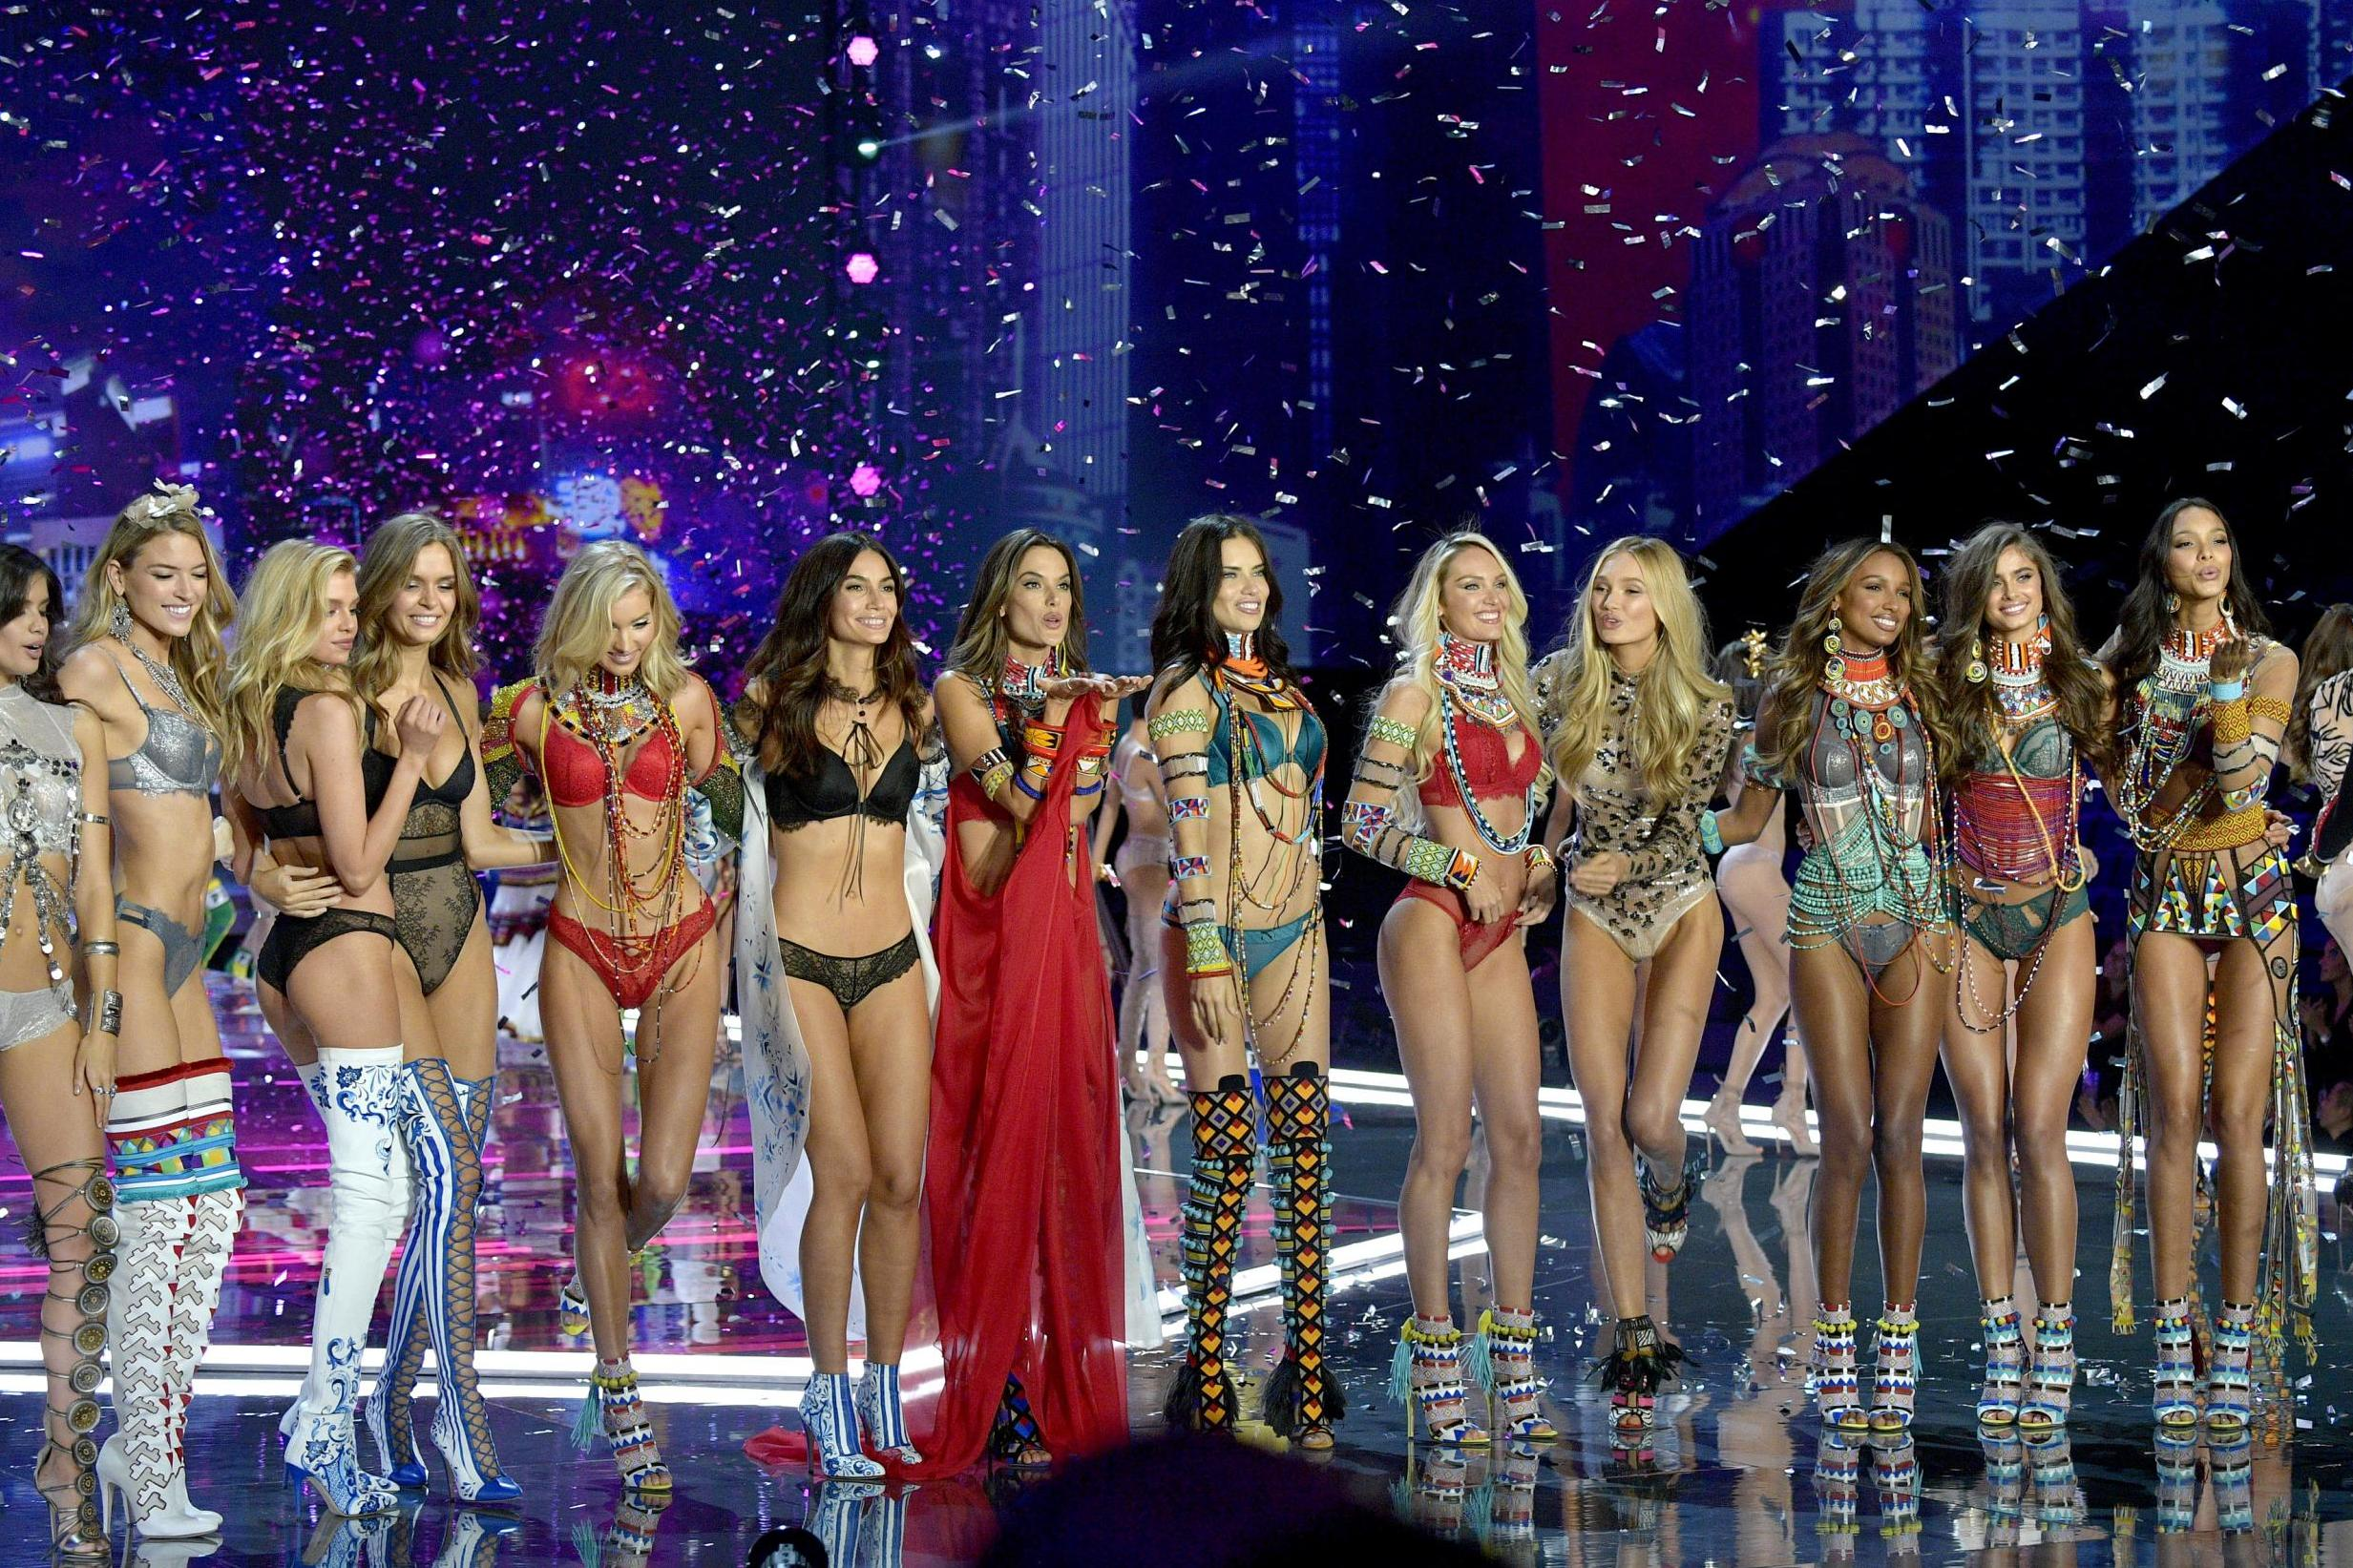 Victorias Secret boss apologises for insensitive trans and plus-size comments advise